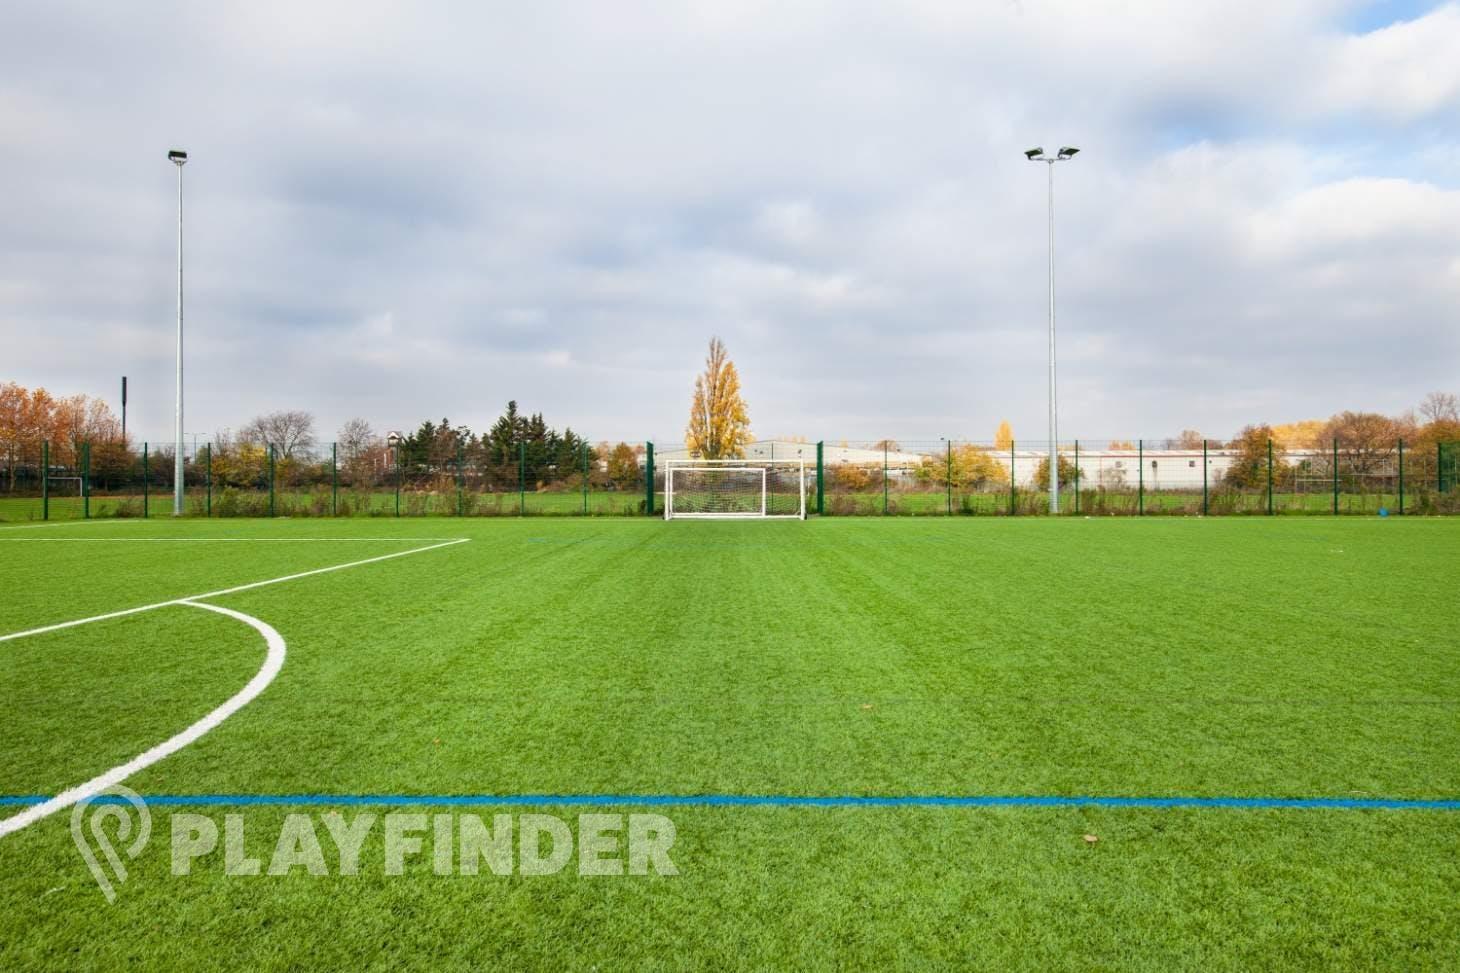 Salisbury Hall Playing Fields 11 a side | 3G Astroturf football pitch